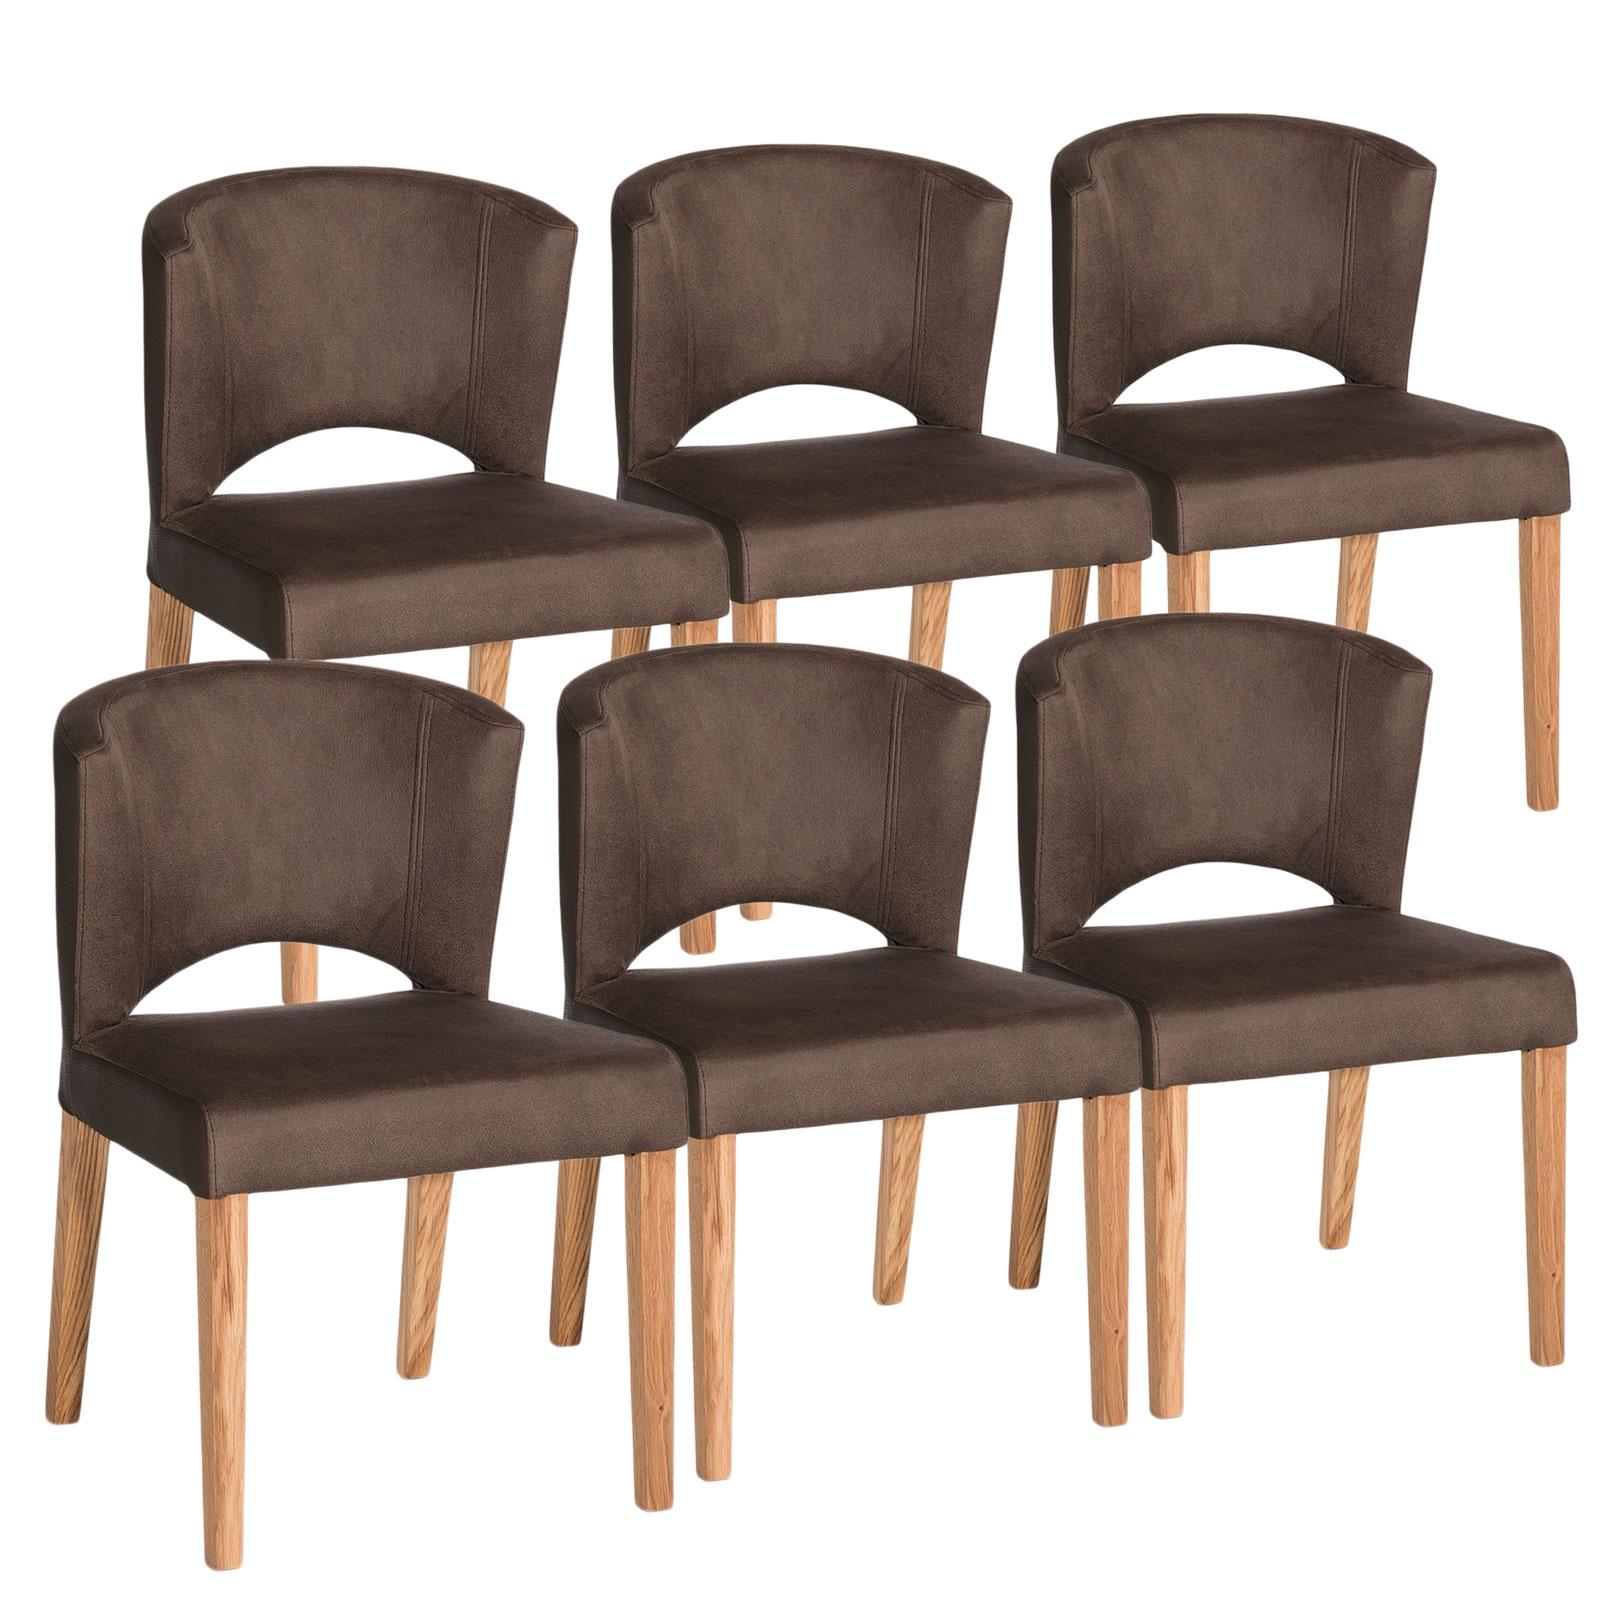 Stück Esszimmer Braun Stuhl Set FestgepolstertWildlederoptik Rimini 6 pGjzSULqMV